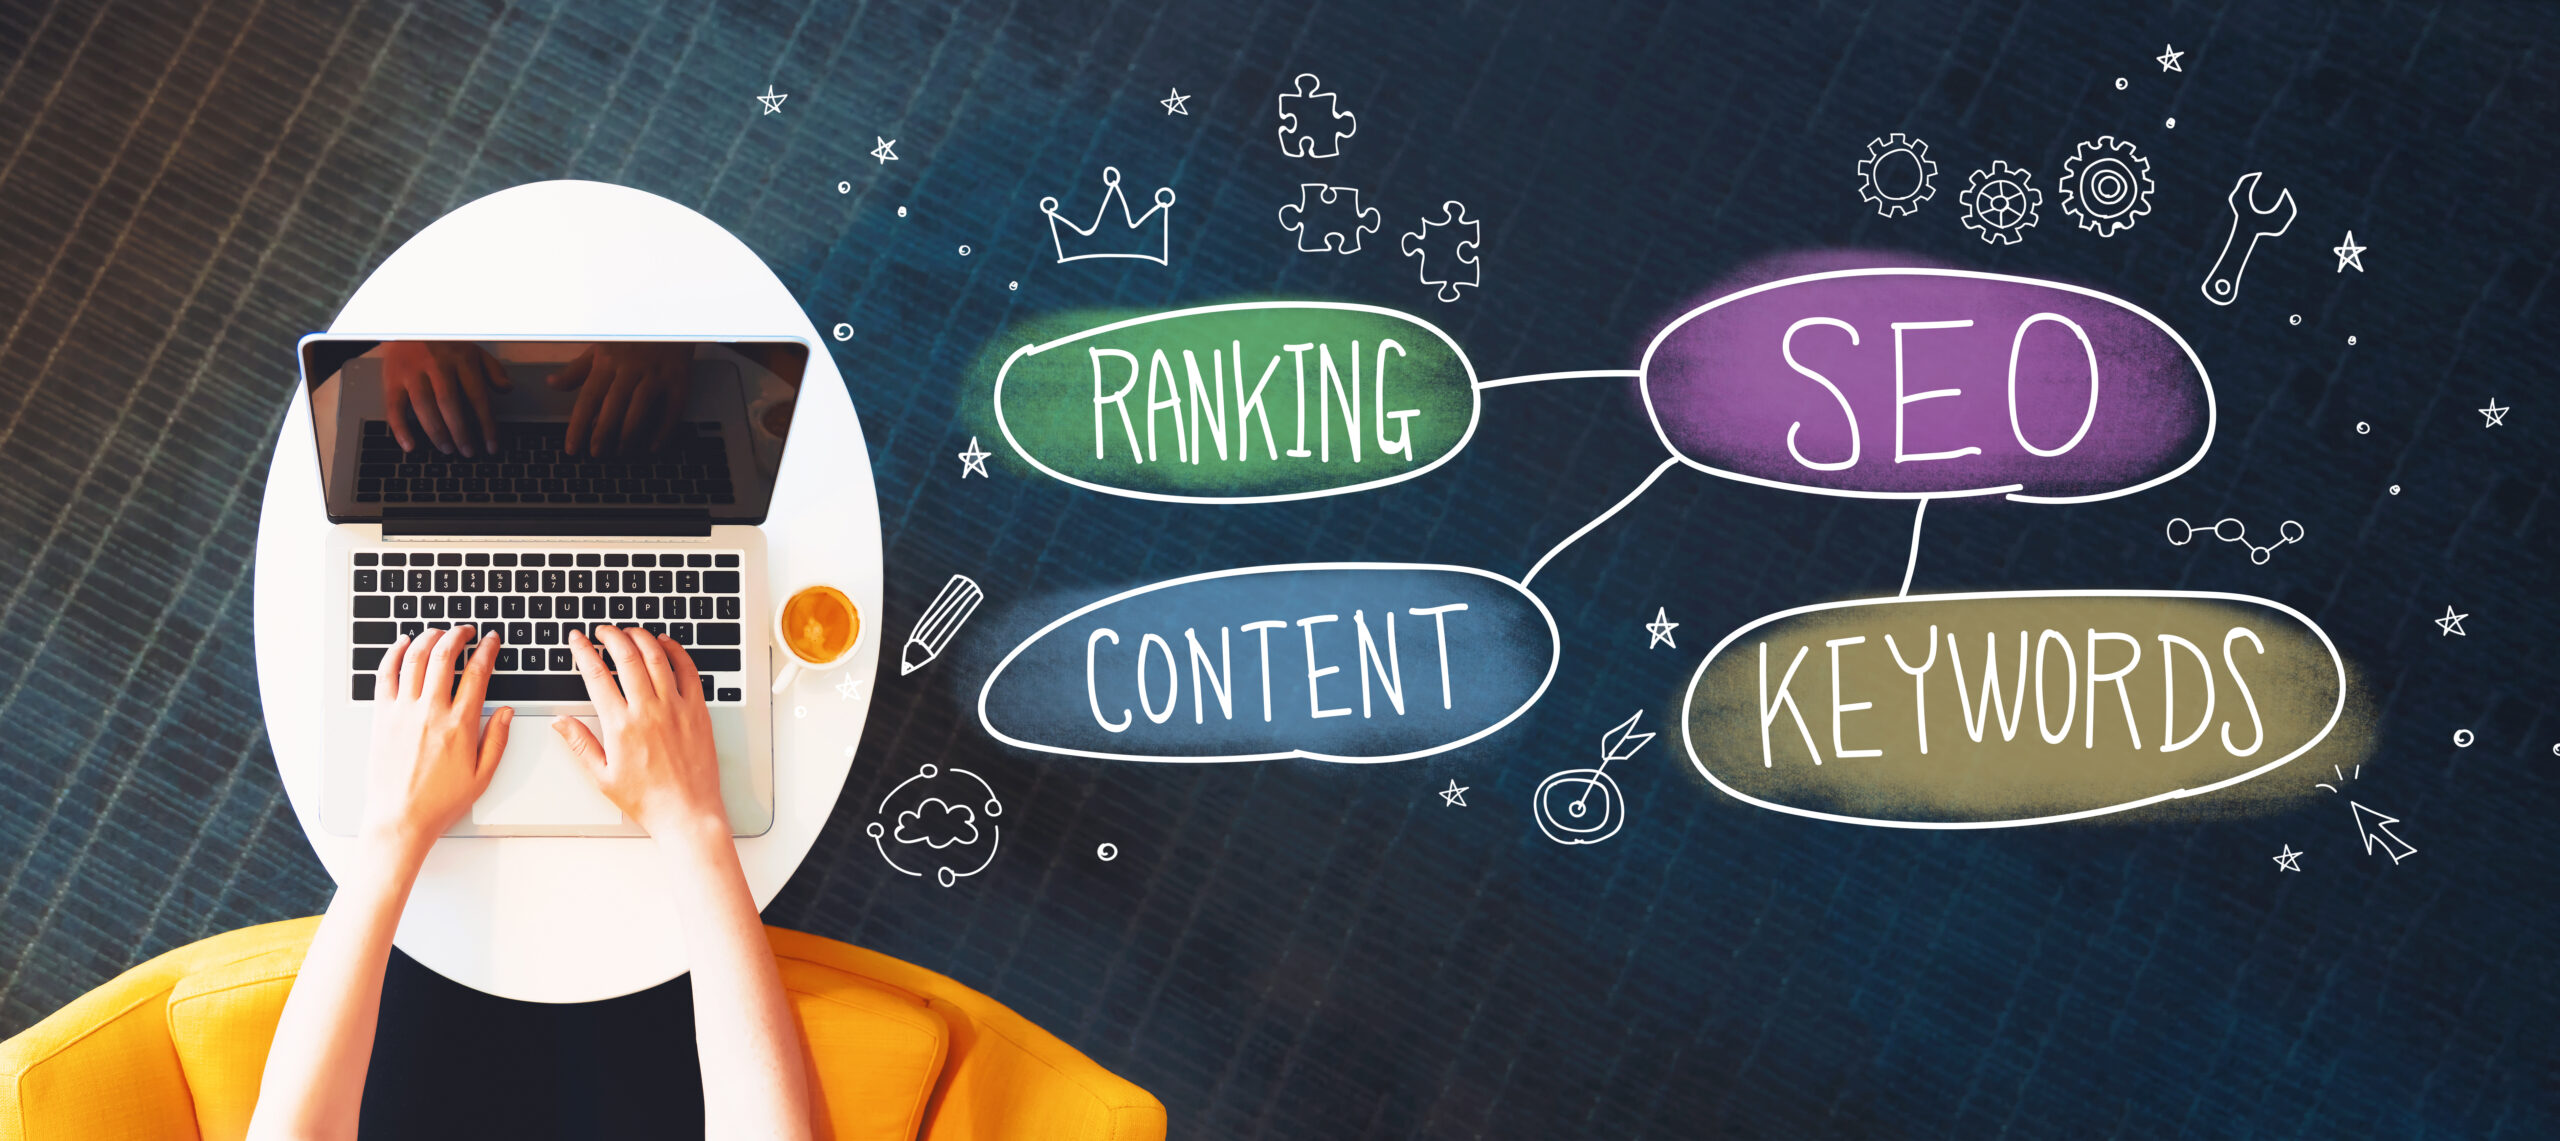 SEO image: Ranking, SEO, Content, Keywords